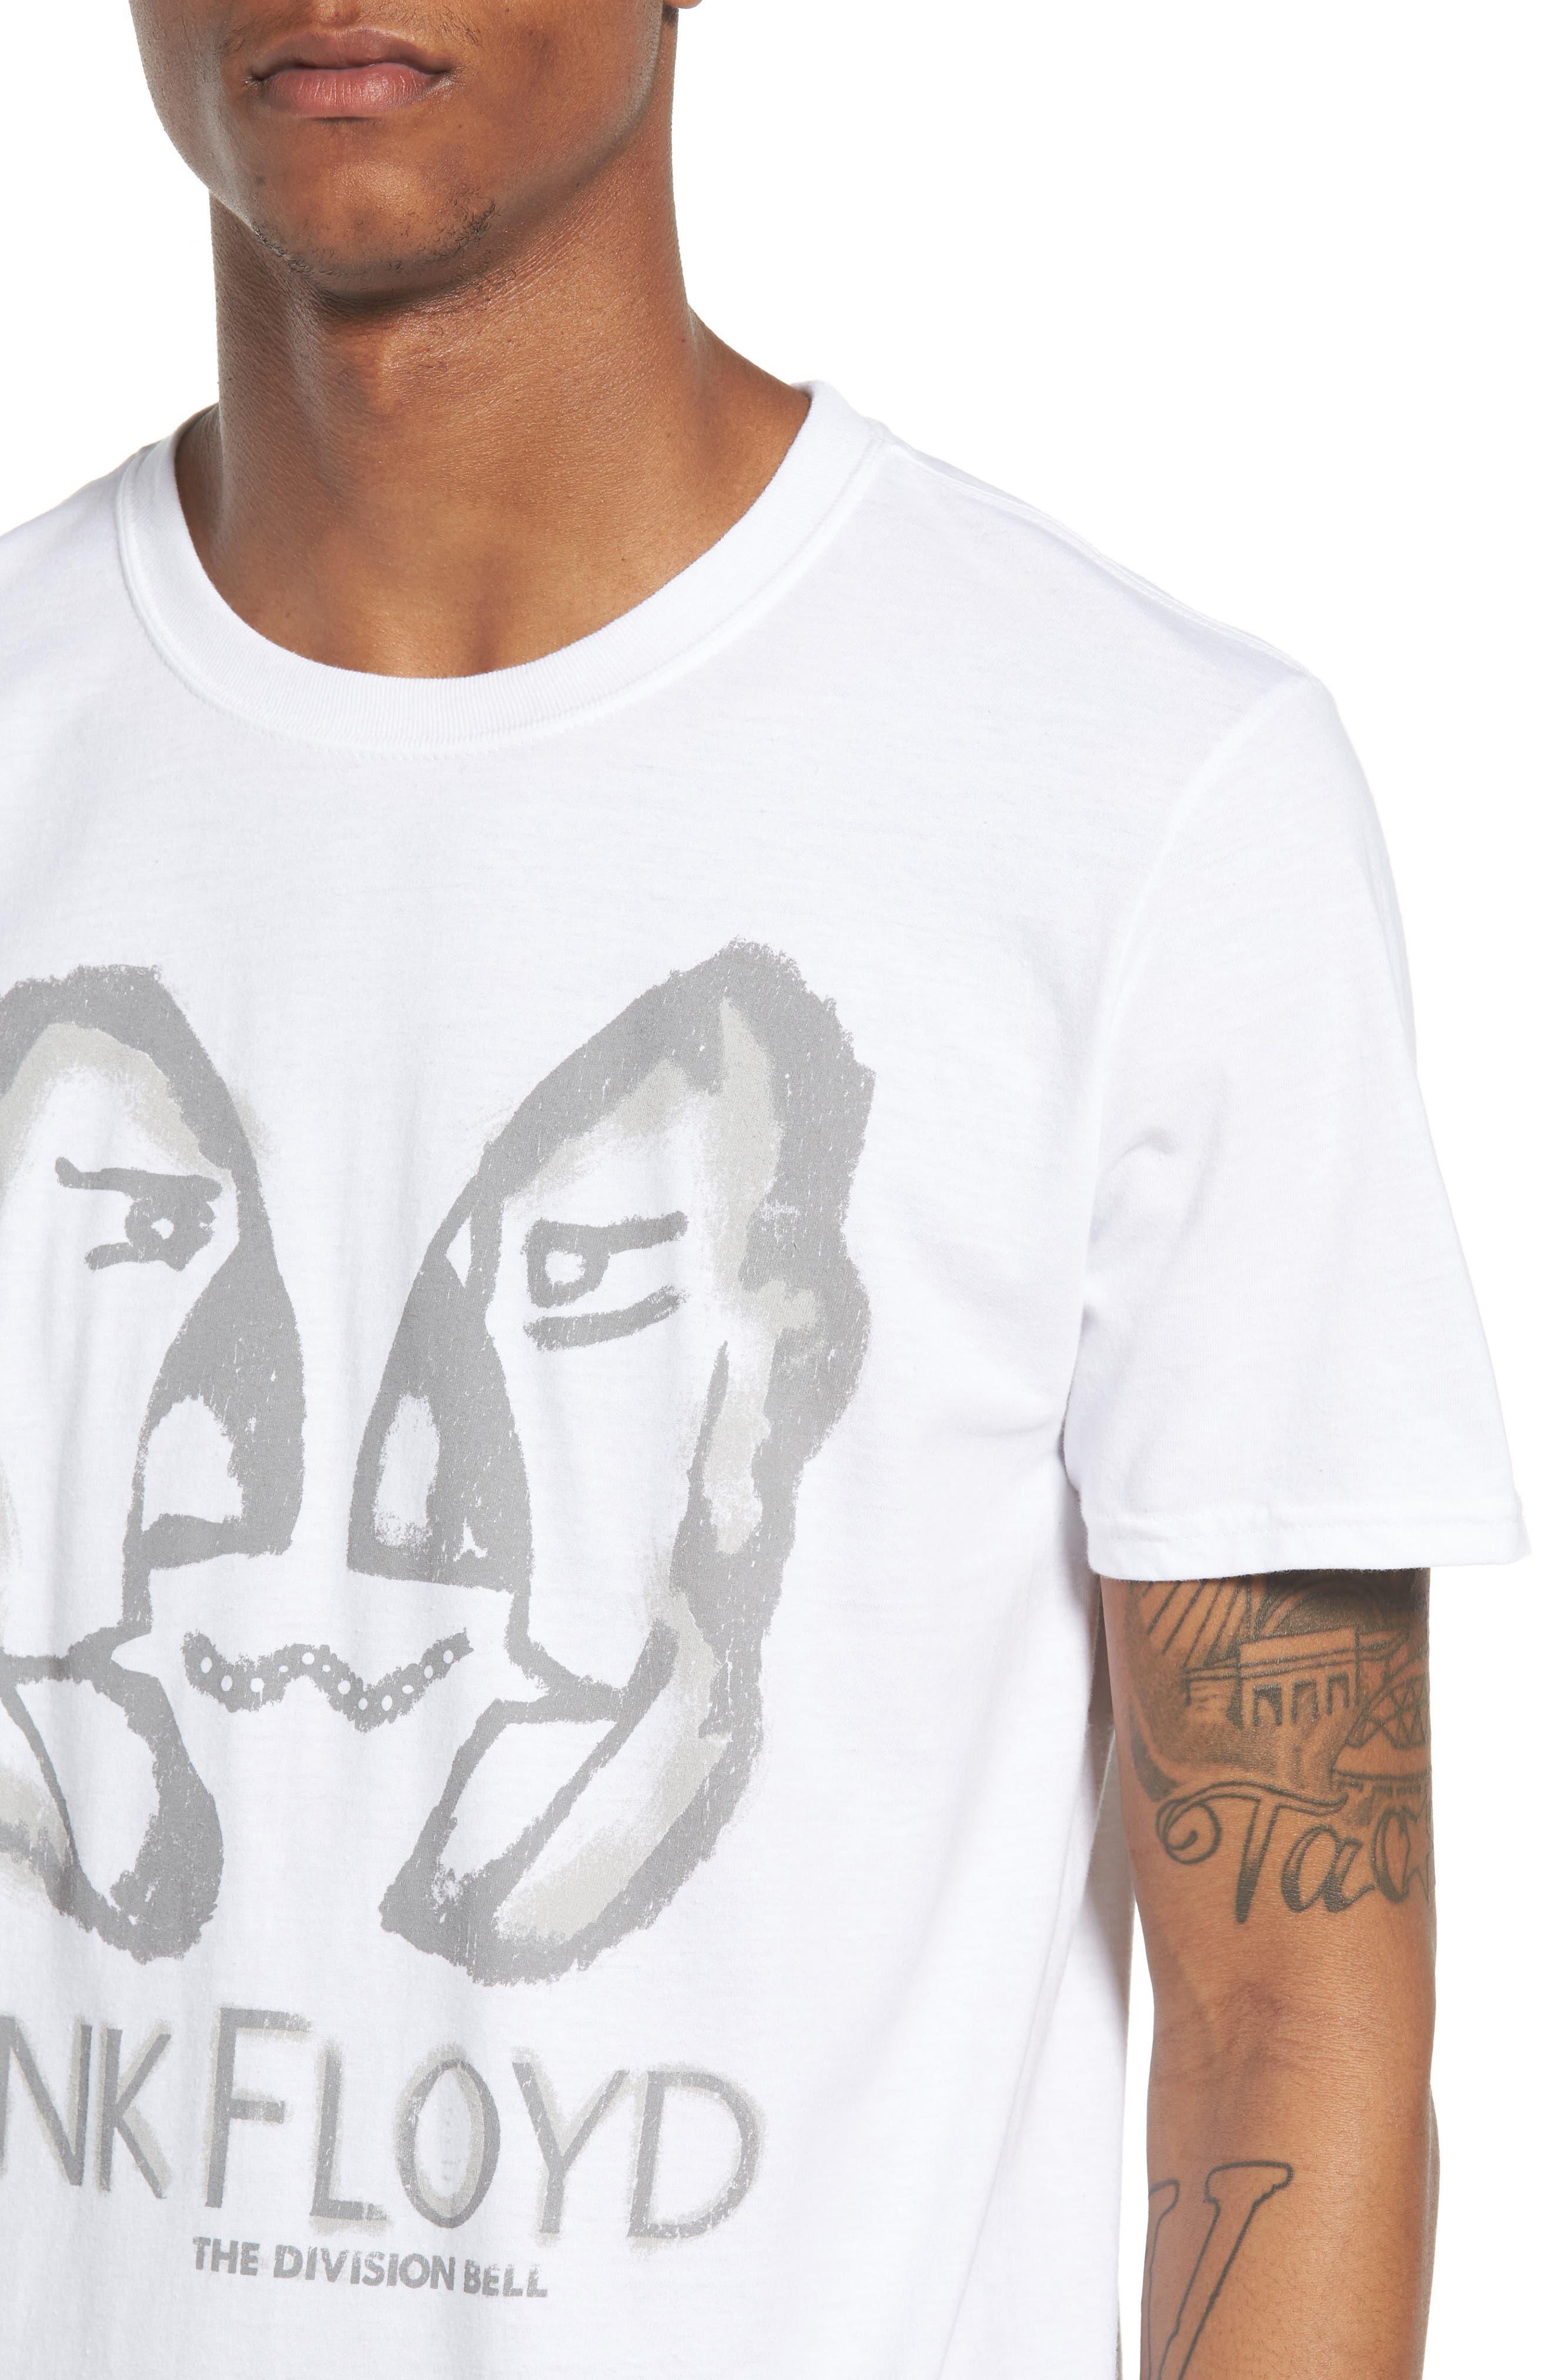 Pink Floyd T-Shirt,                             Alternate thumbnail 4, color,                             White Pink Floyd